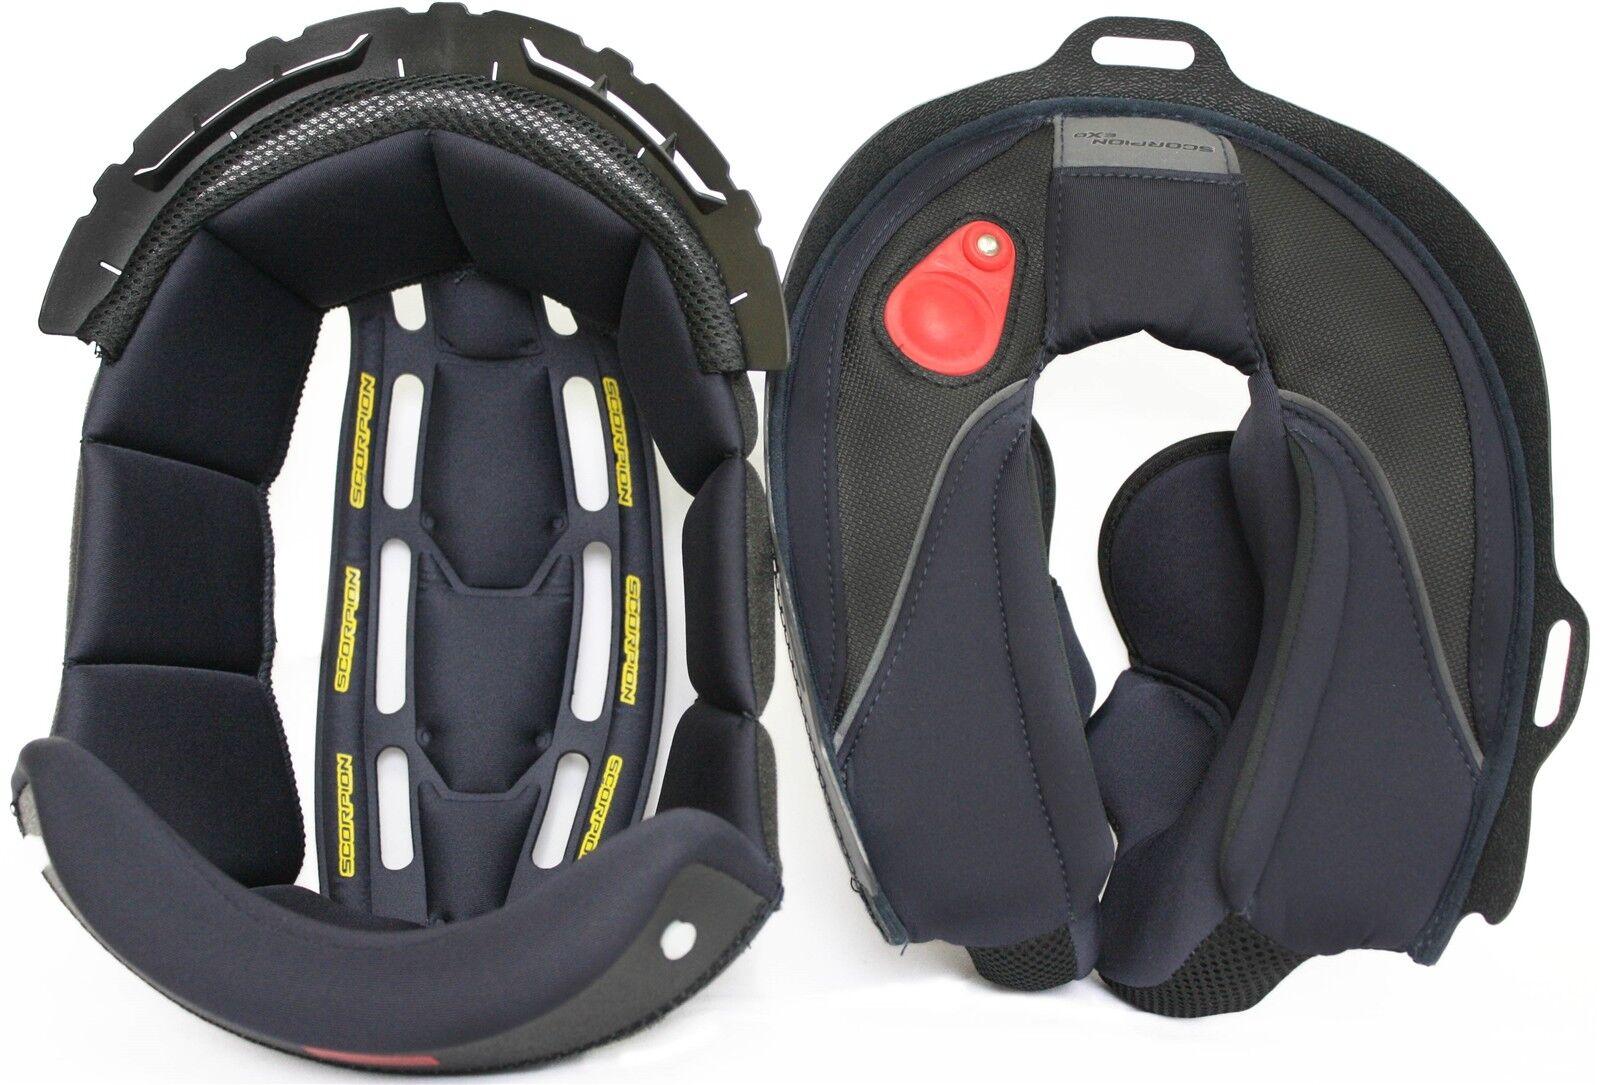 ORIGINAL SCORPION forro interior  para casco motocicleta exo-3000 Air cojín del  discount store